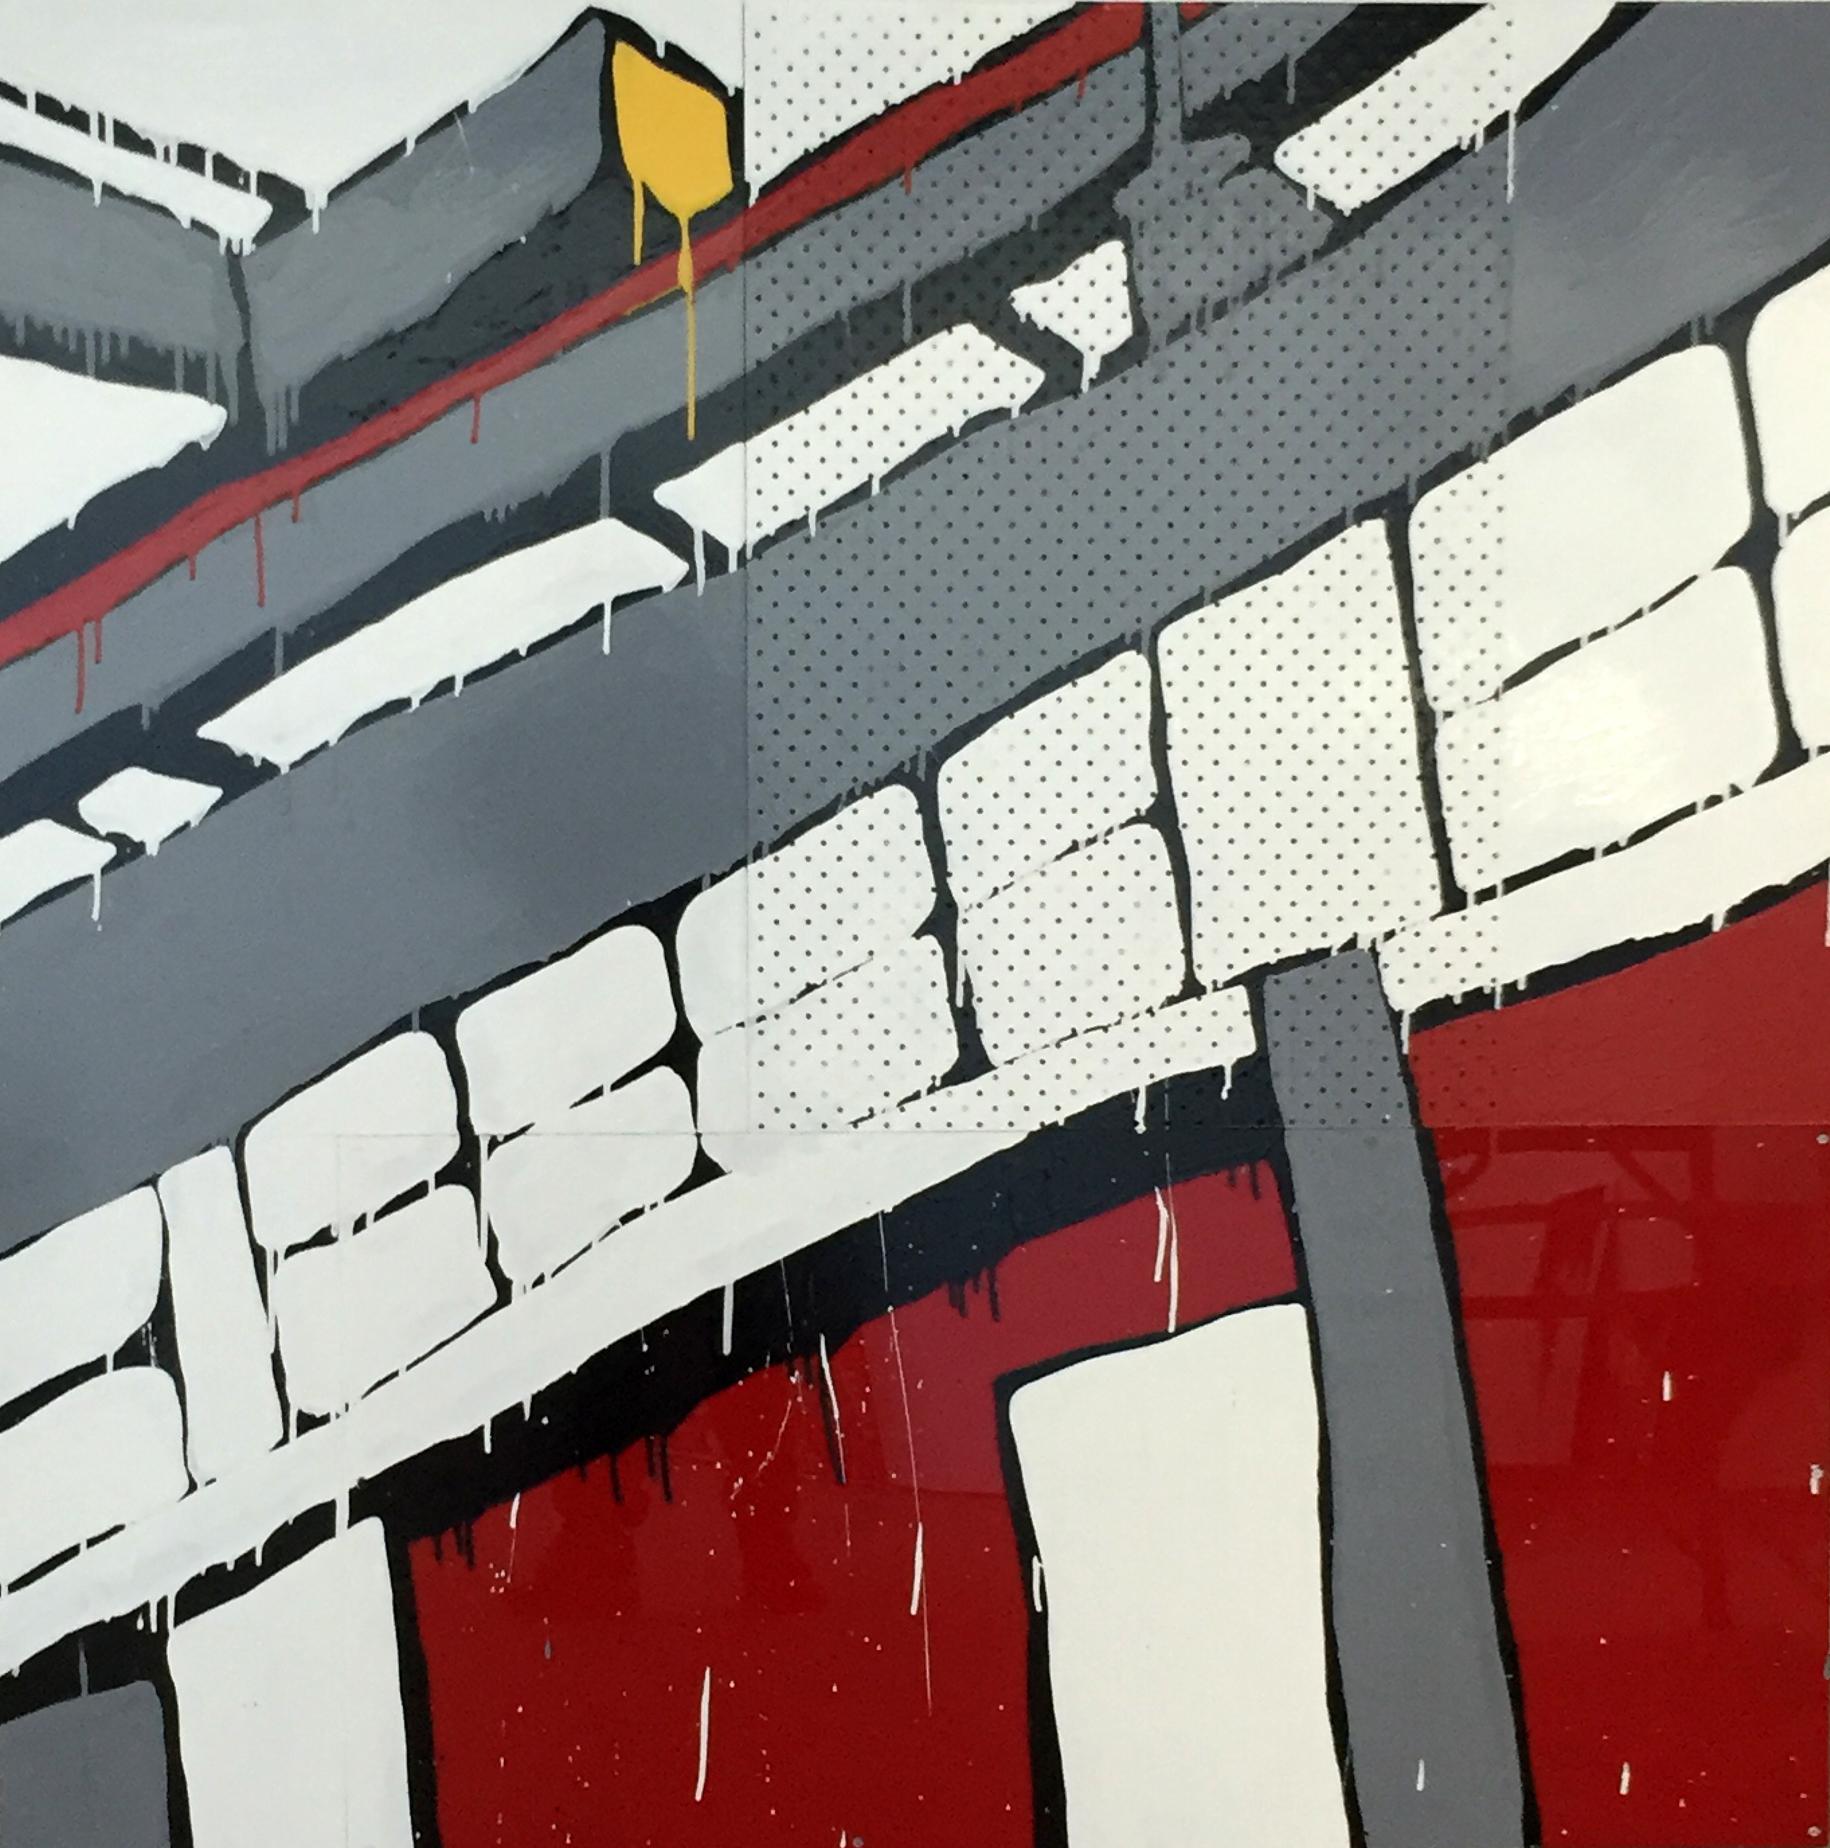 Jasper Knight, North Wharf No. 5 Berth 150 x 150 cm, available